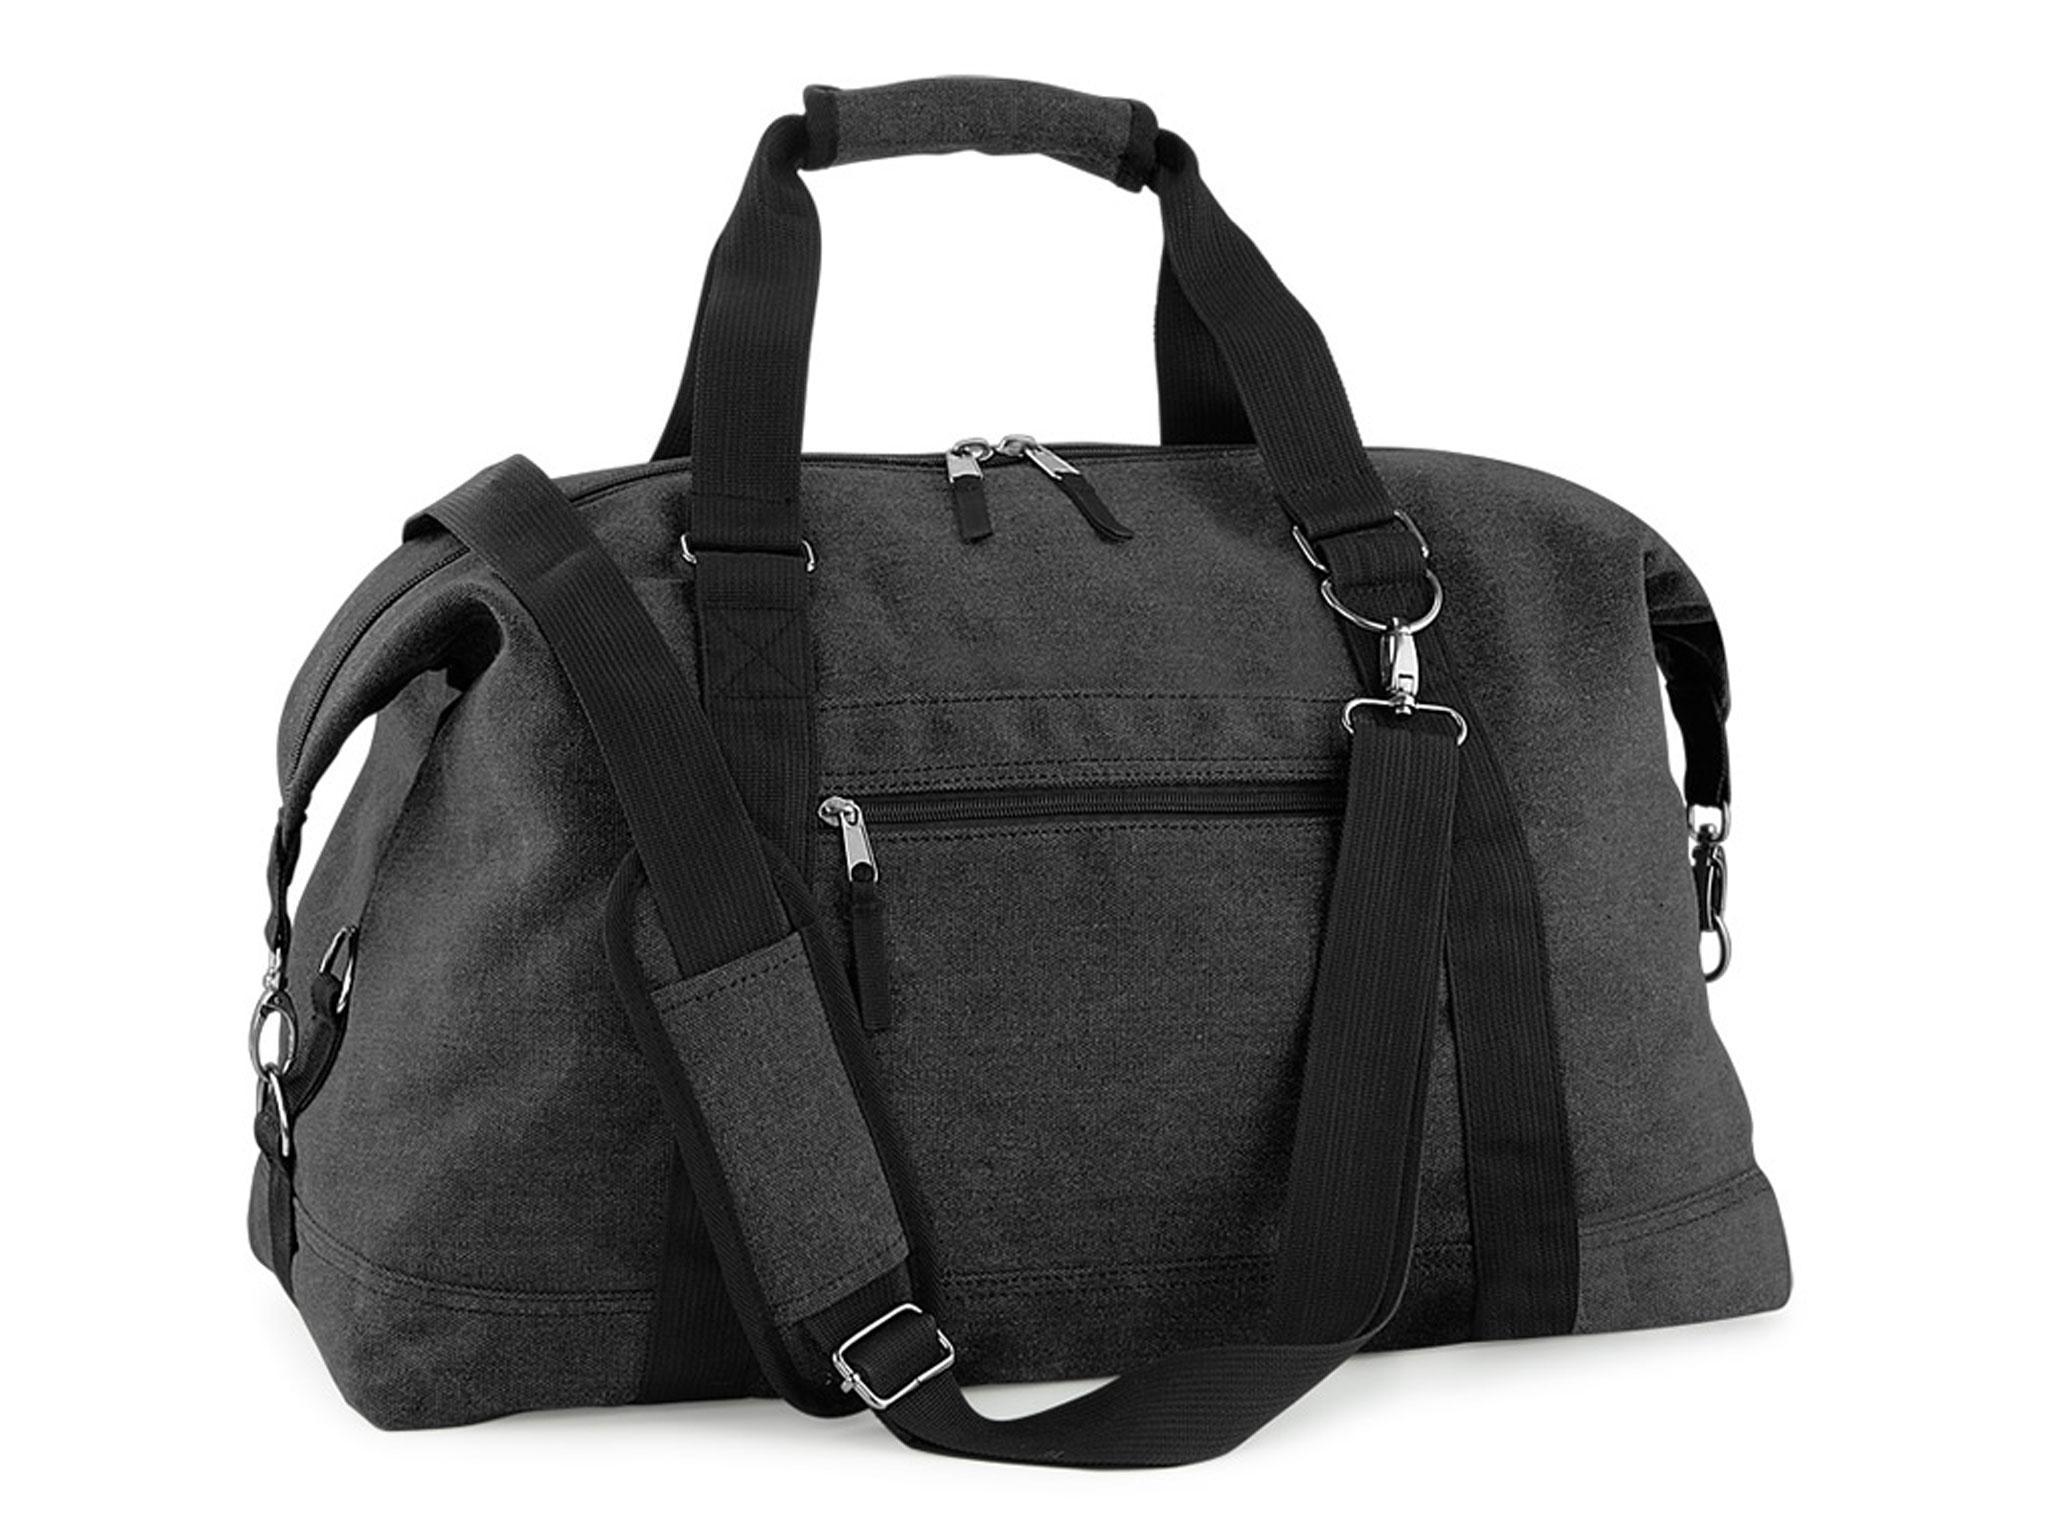 baa97732c0 Big Stitch Personalised Canvas Bag  £35